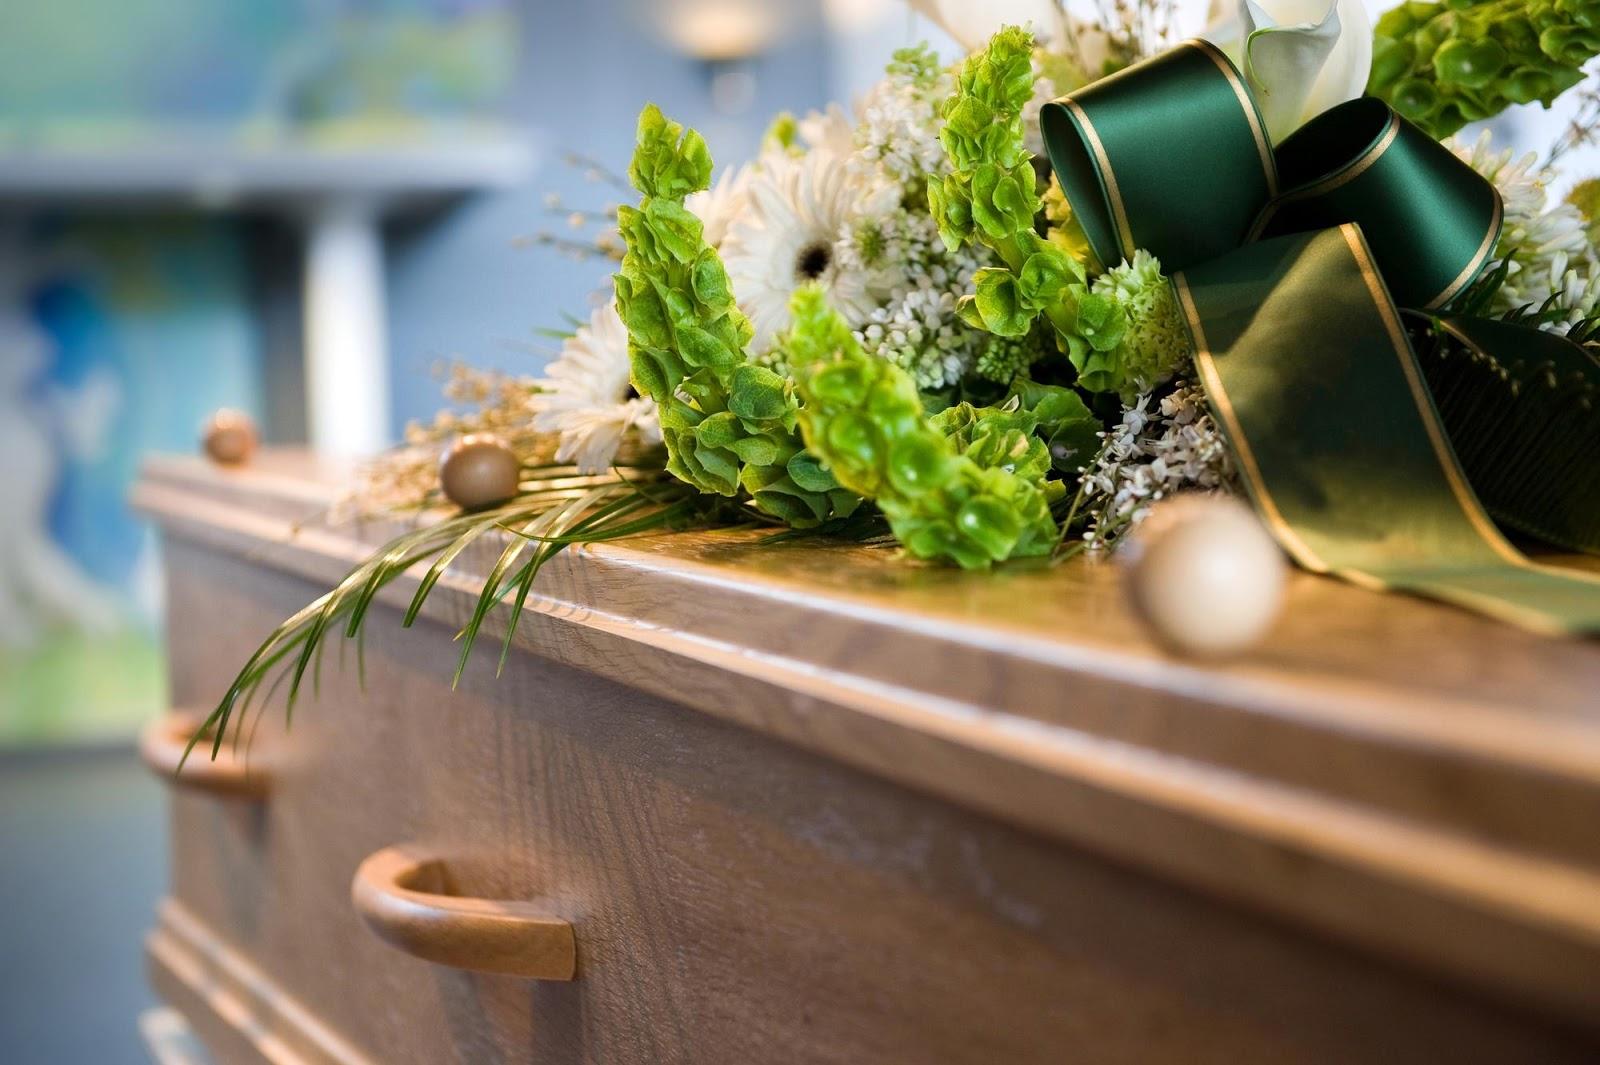 Need To Make Funeral Arrangements?